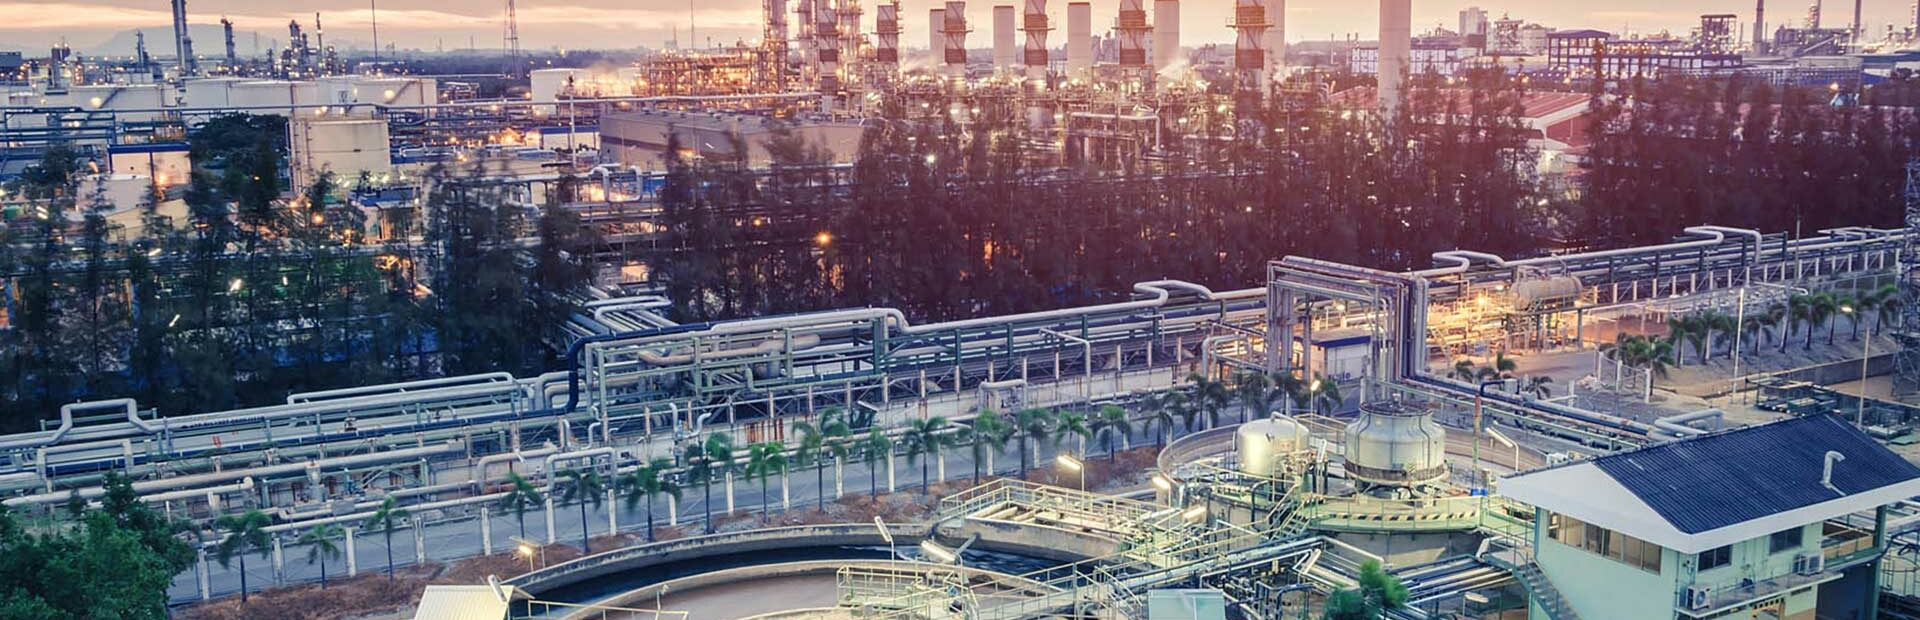 Sewage wastewater treatment, municipal wastewater treatment and transport, sludge dewatering, sludge process